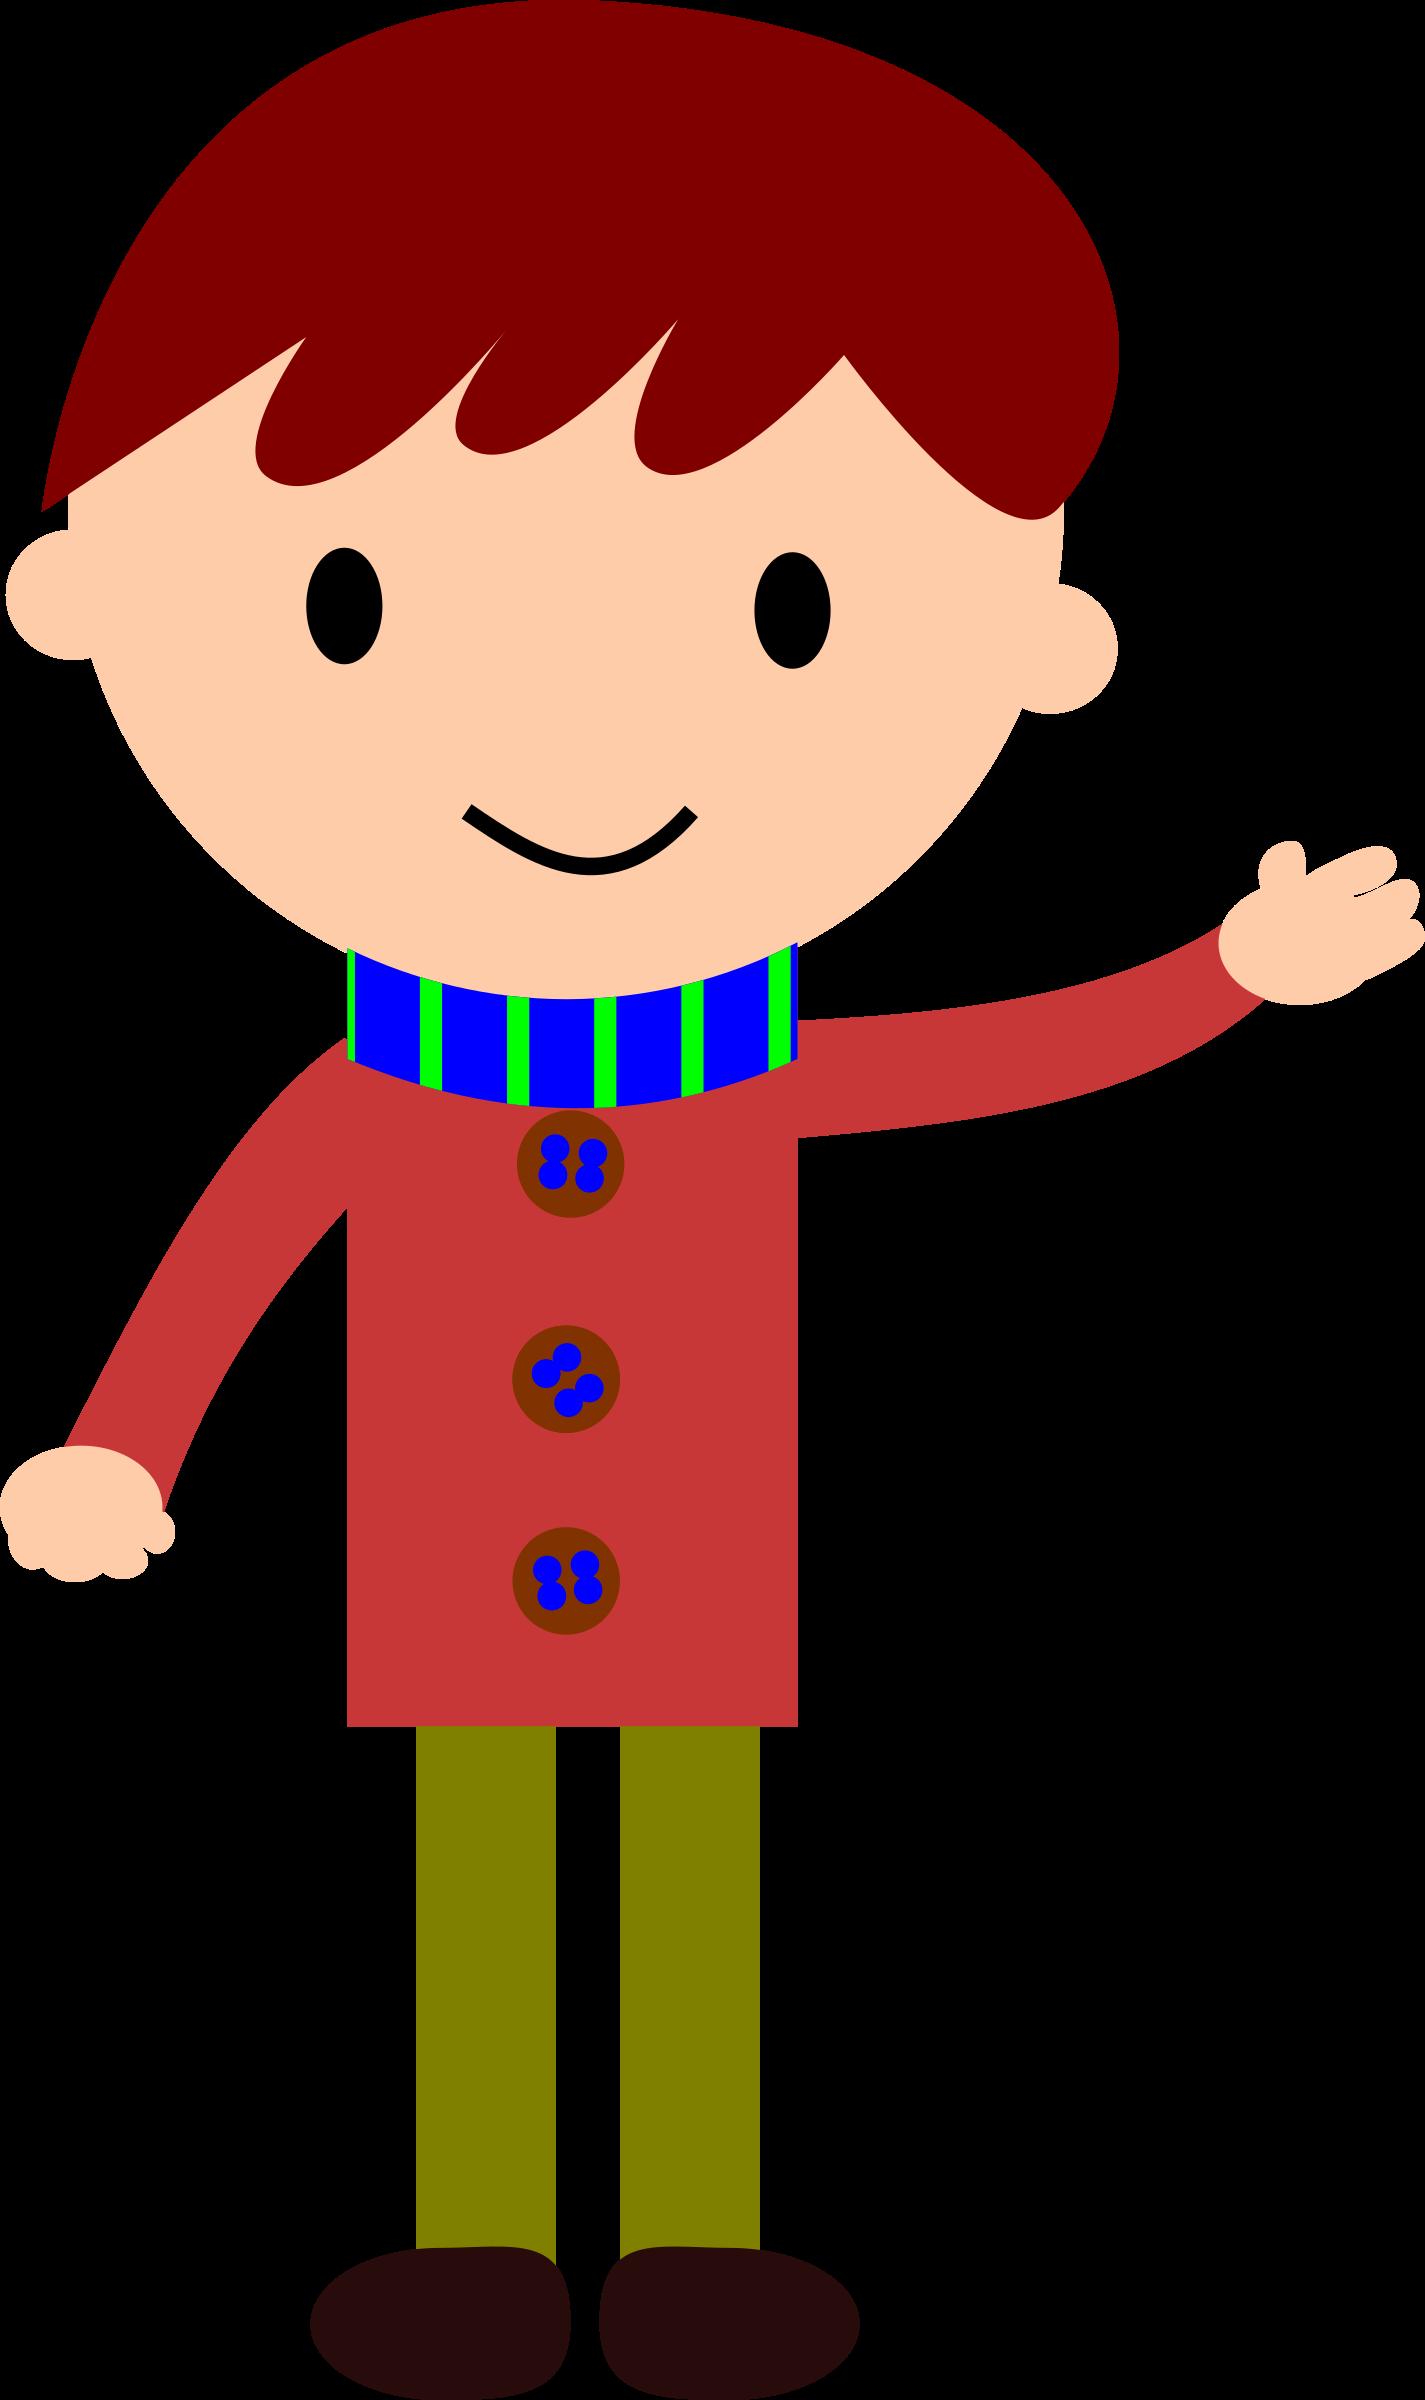 Clipart - boy waving hand (1425 x 2400 Pixel)